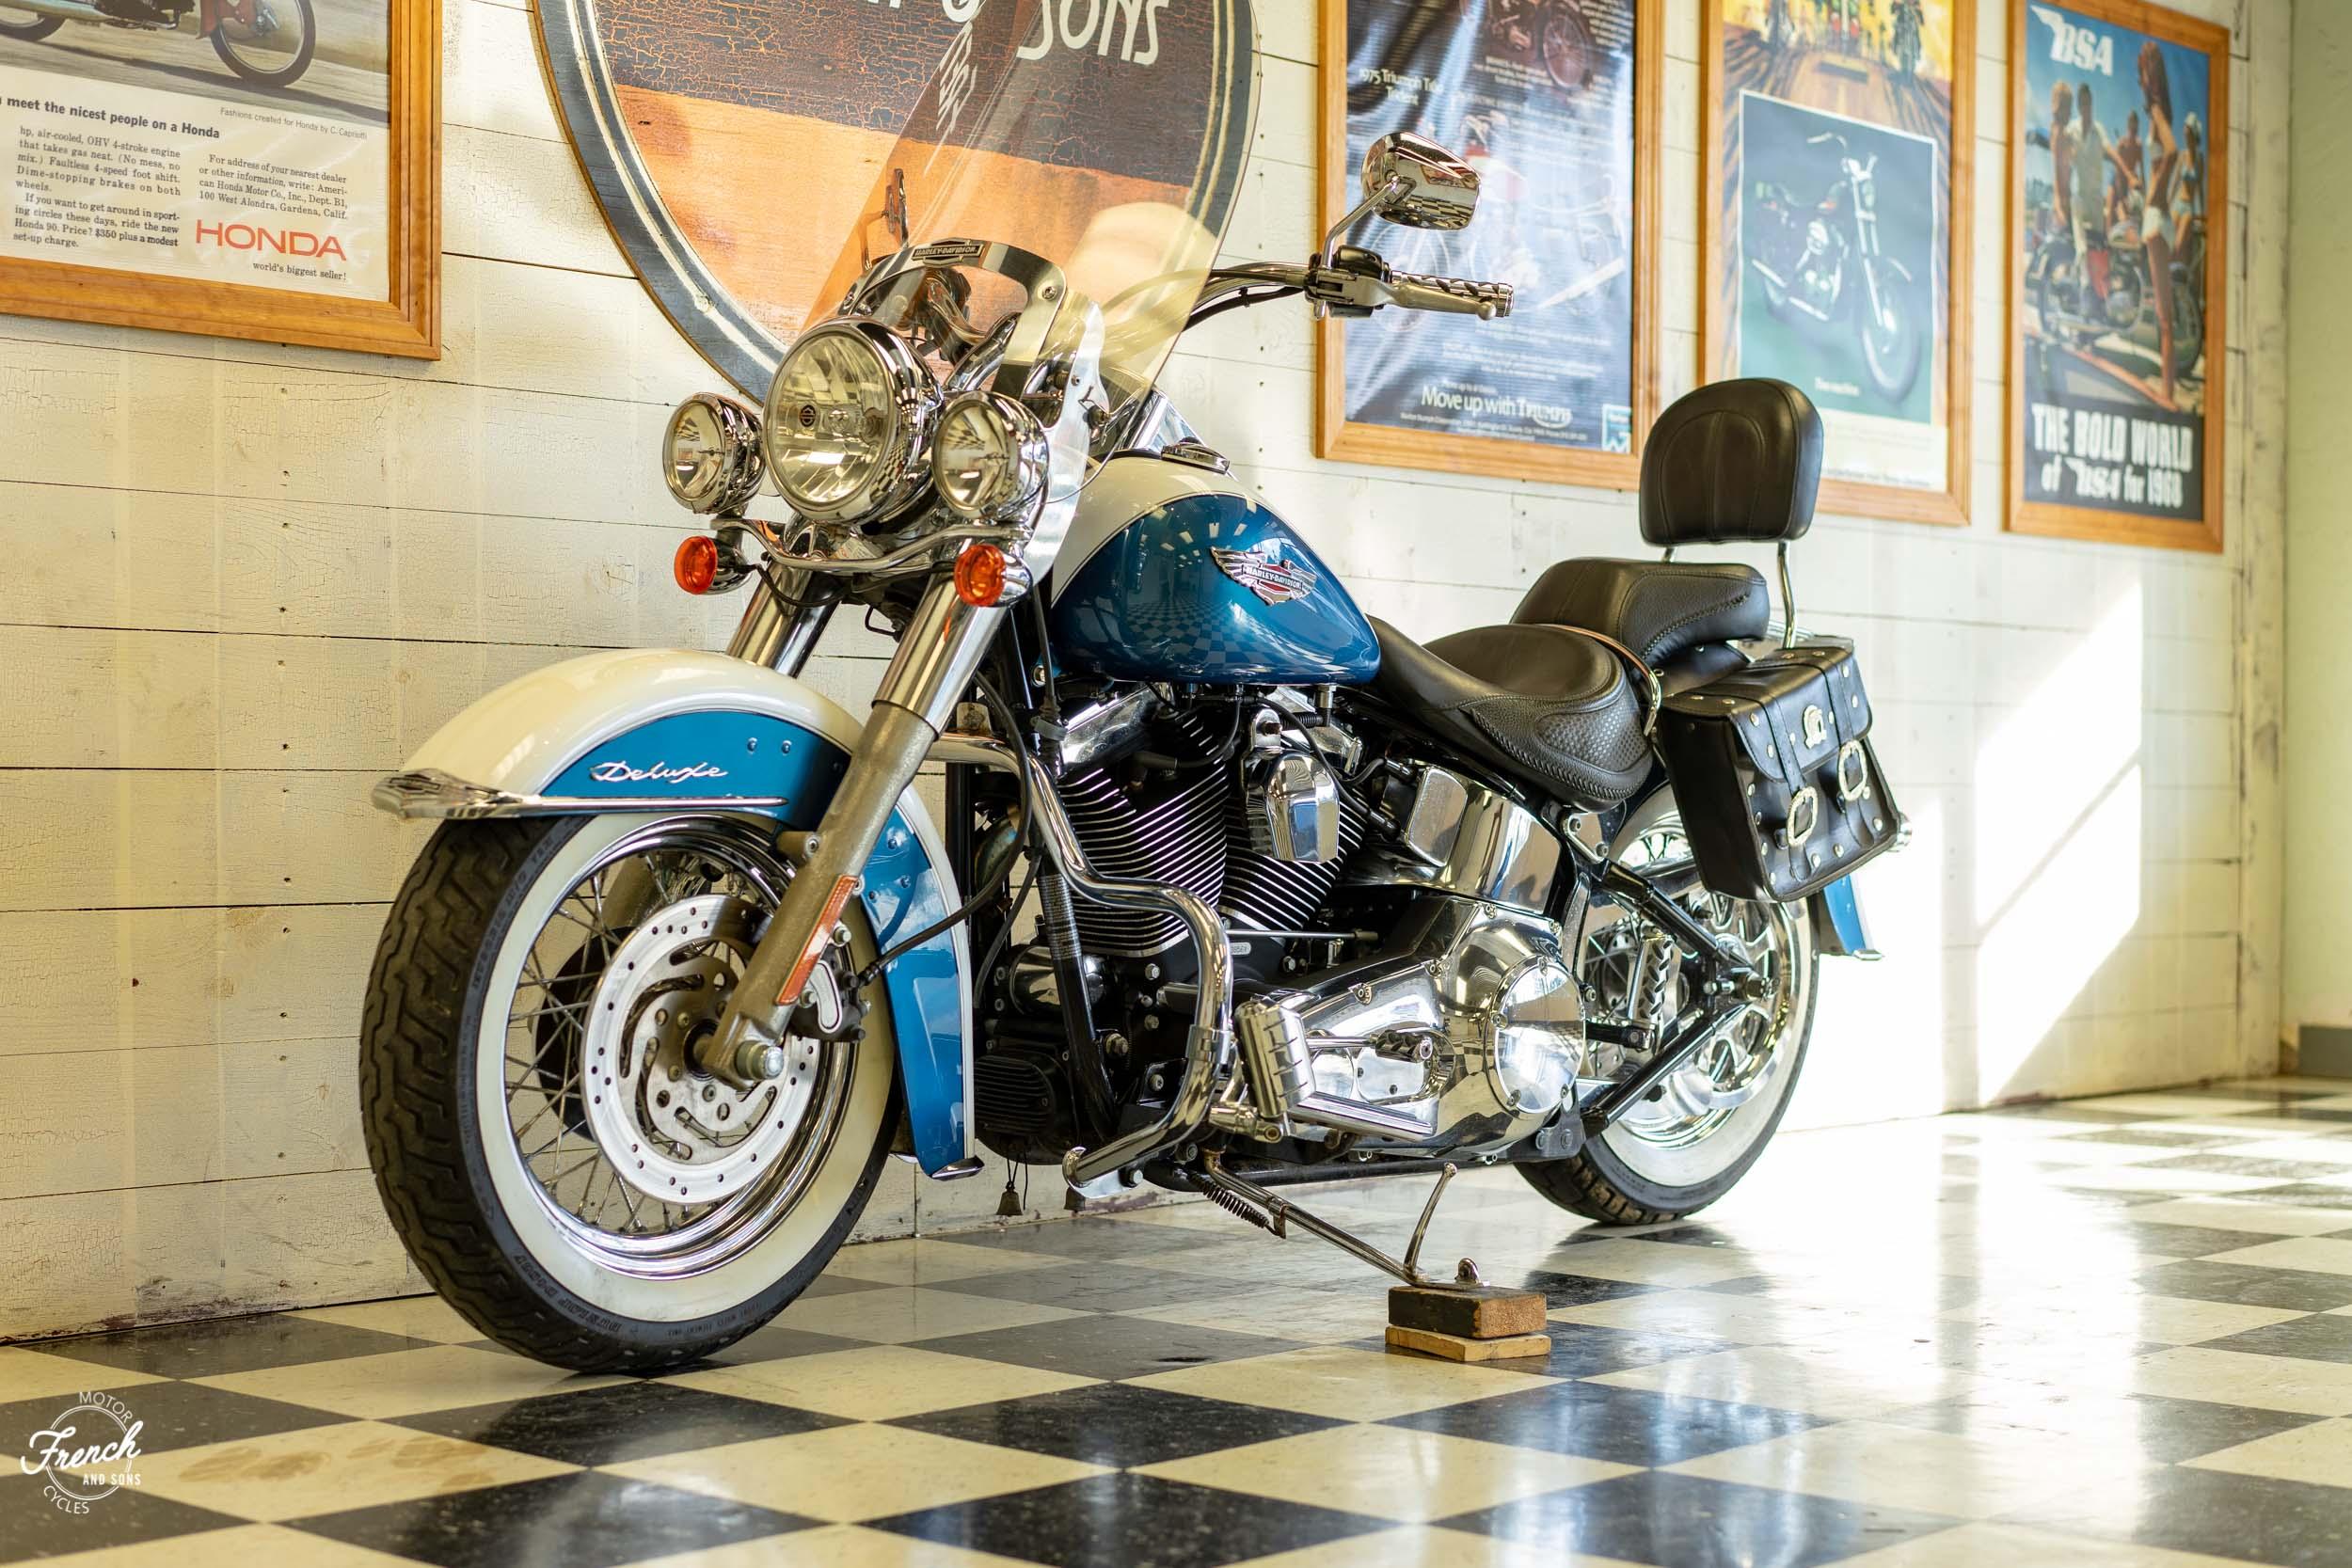 2005_Harley_Davidson_Softail_Deluxe-20.jpg